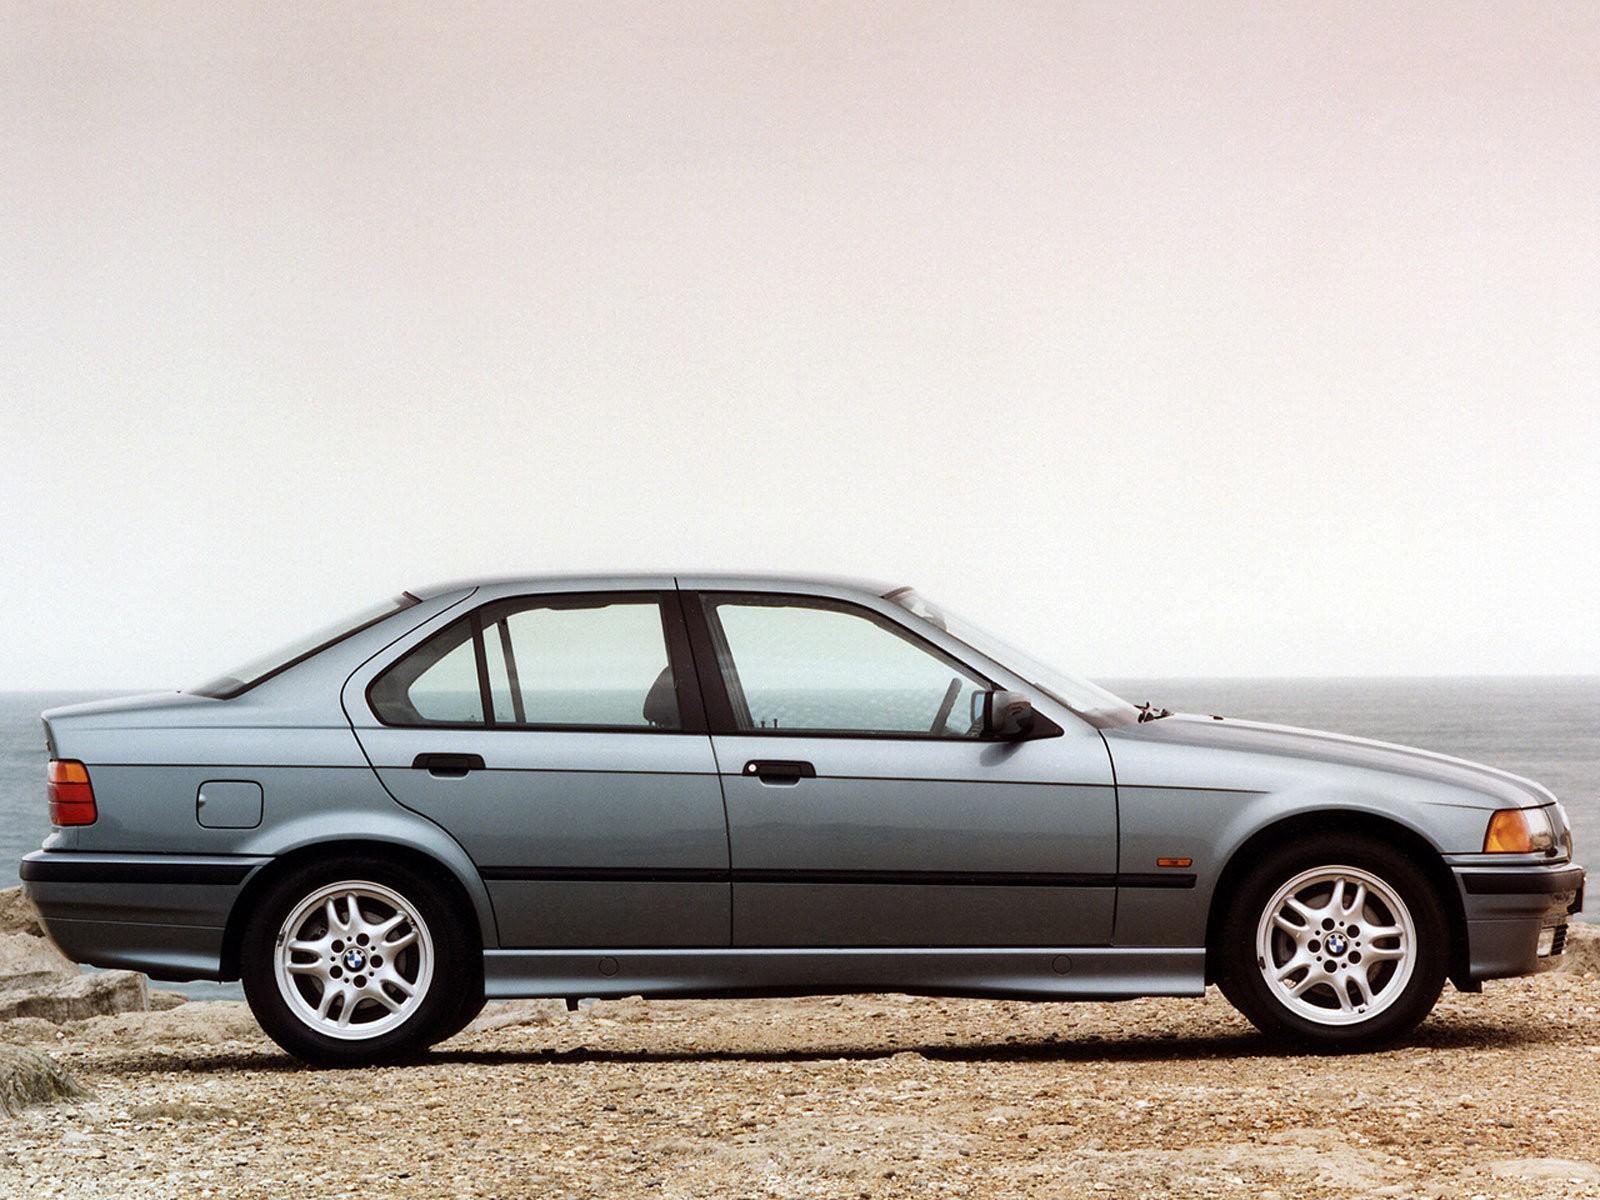 bmw 3 series sedan e36 1991 1992 1993 1994 1995 1996 1997 1998 autoevolution. Black Bedroom Furniture Sets. Home Design Ideas